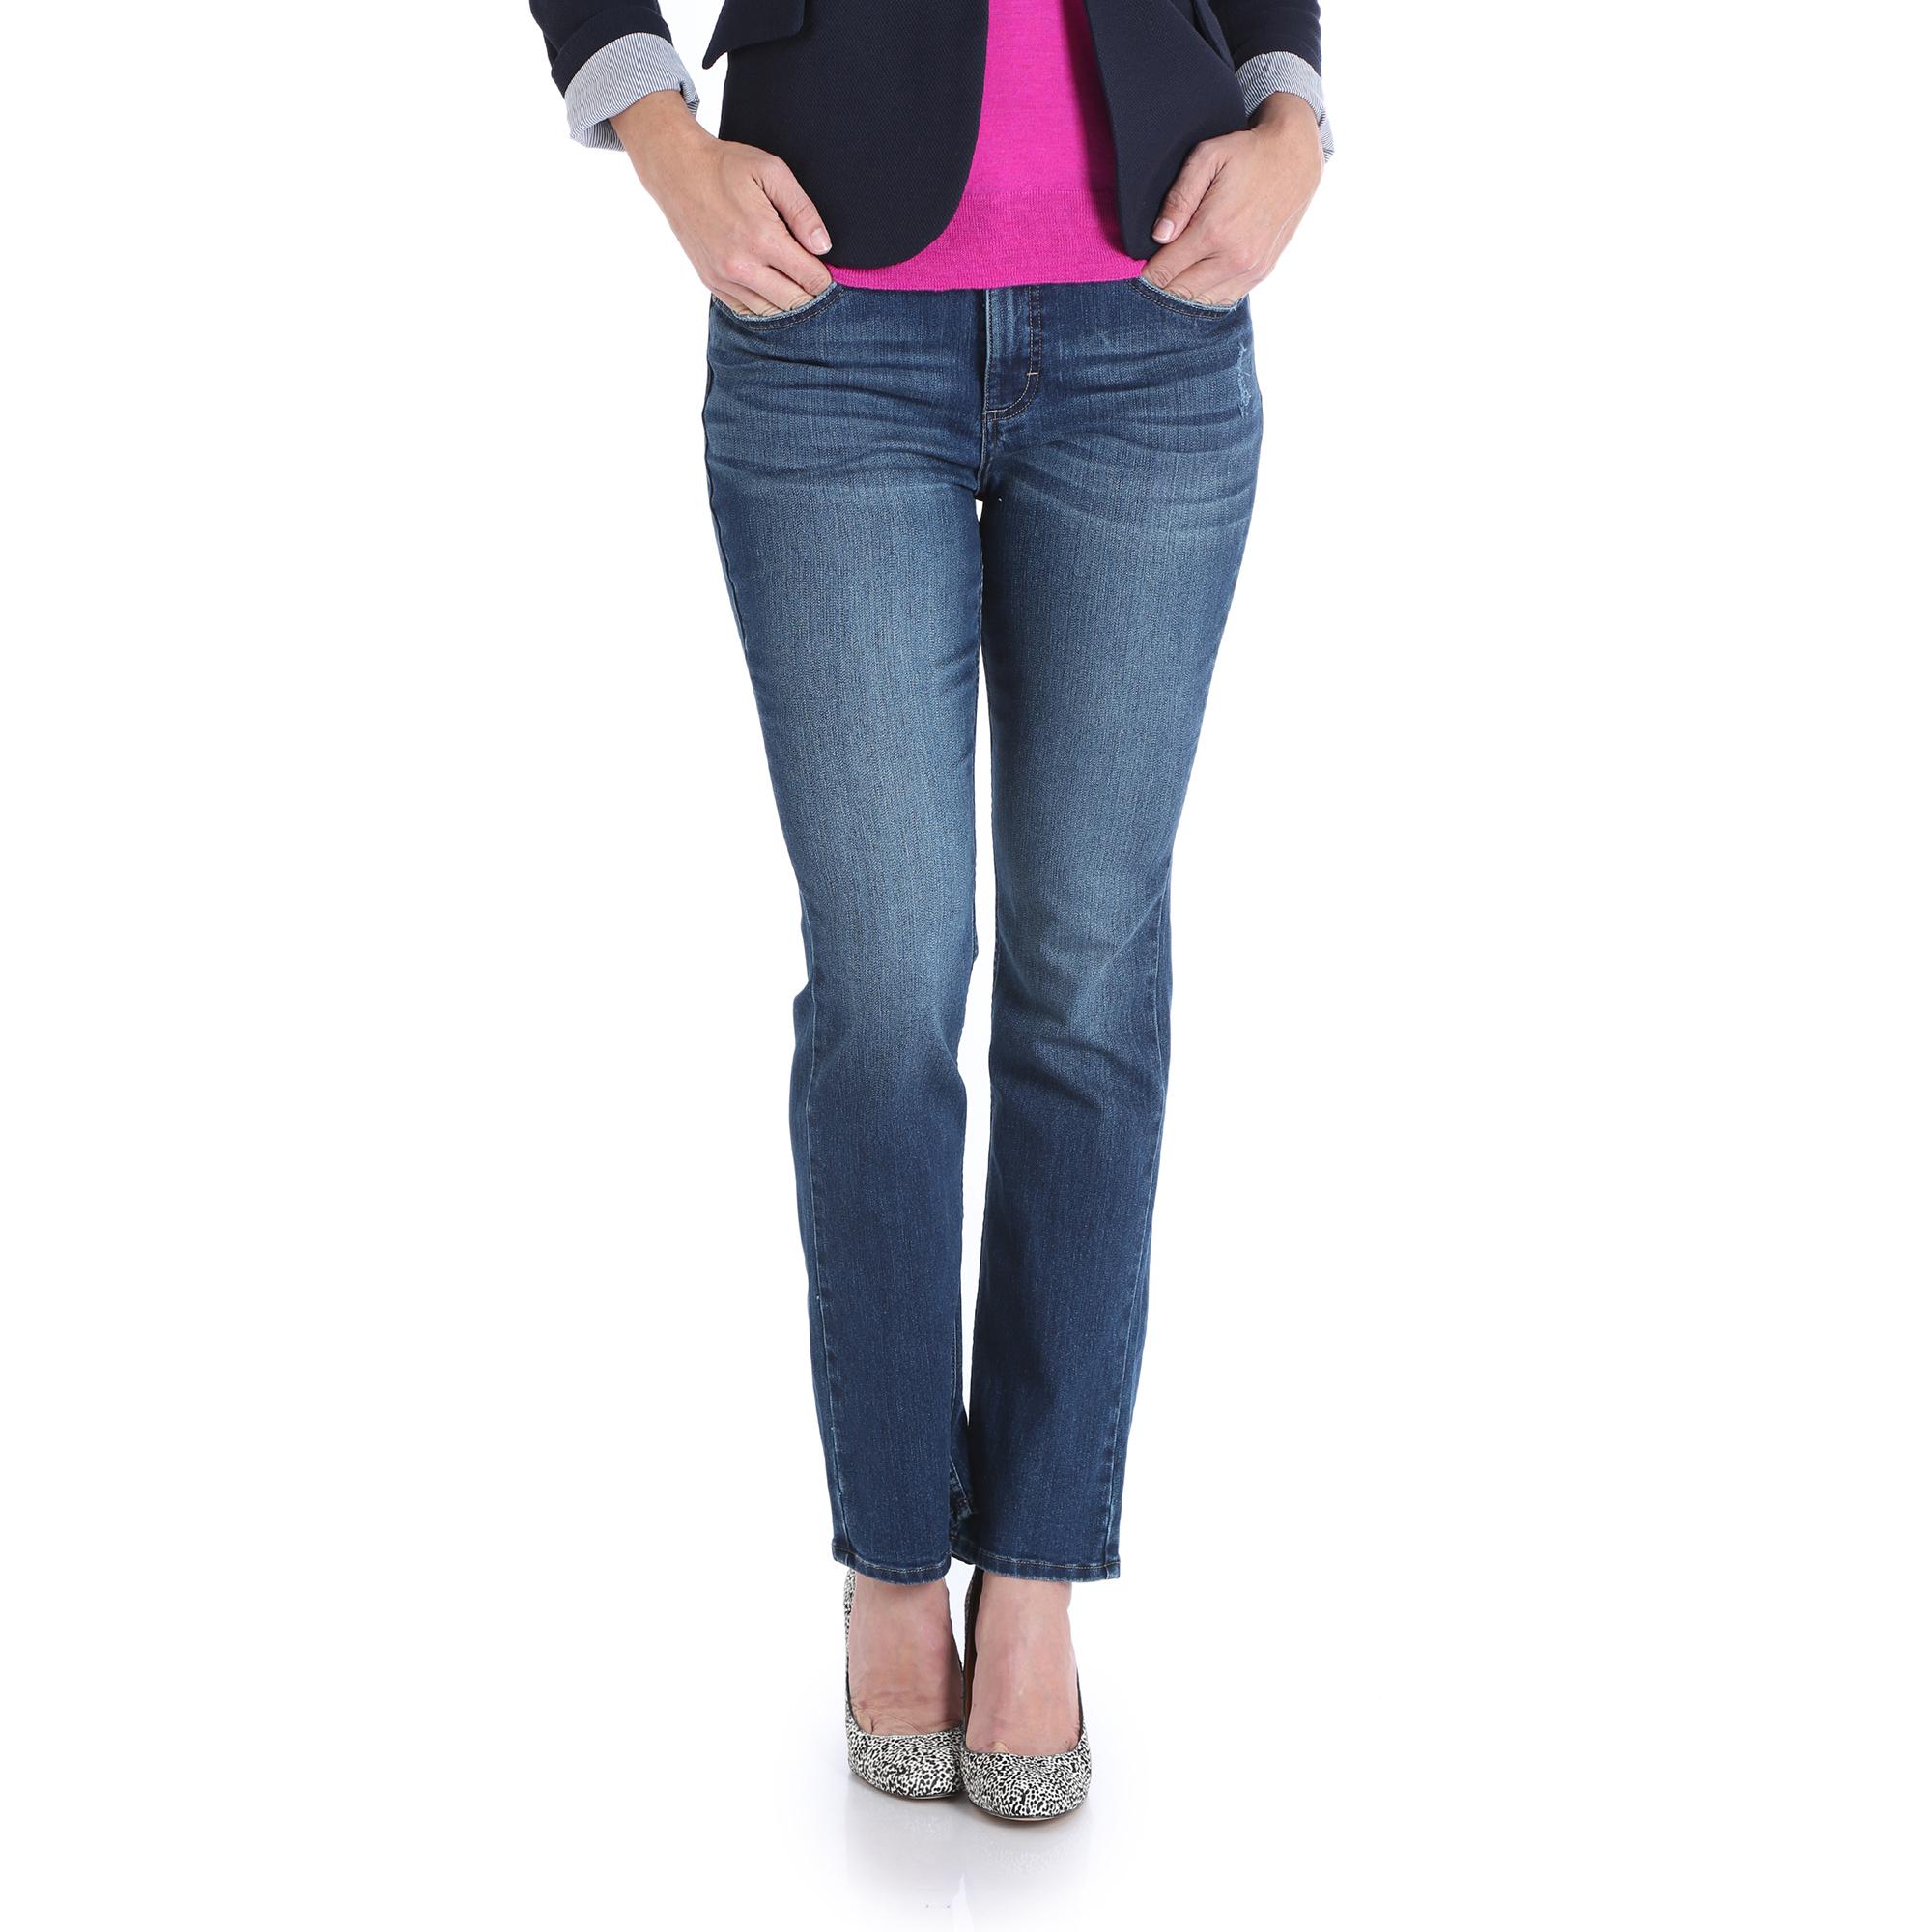 1SMTCW6 - Midrise Straight Jean